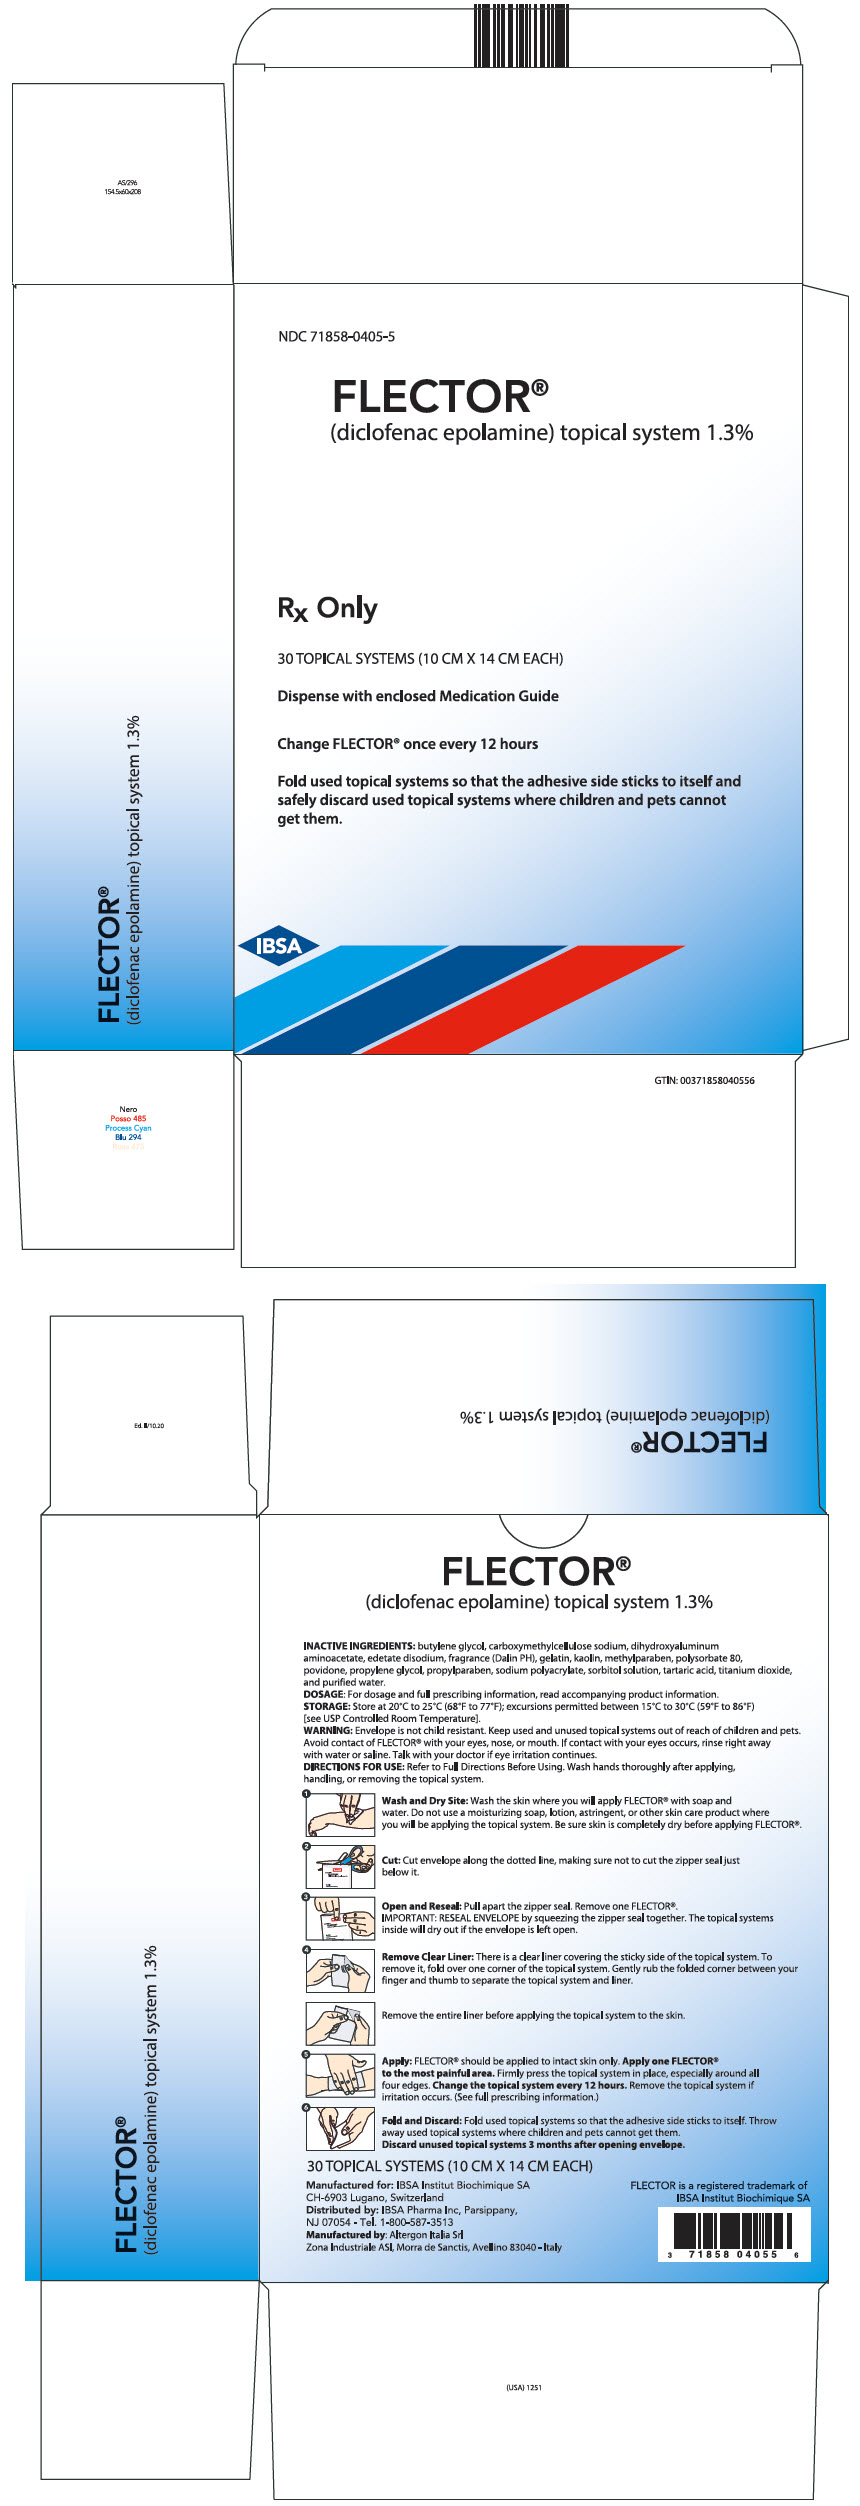 PRINCIPAL DISPLAY PANEL - 30 Patch Pouch Carton